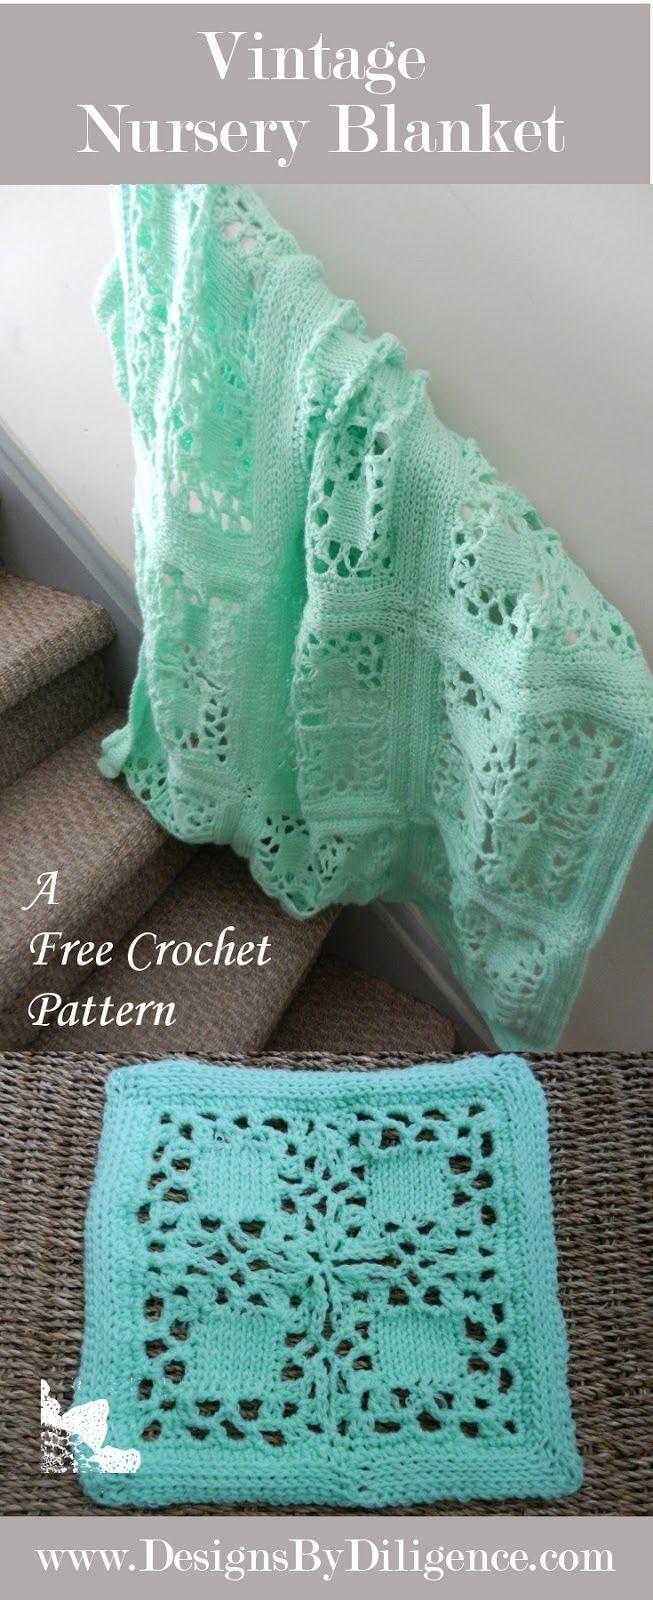 Designs by Diligence: Vintage Nursery Blanket: FREE #crochet pattern ...